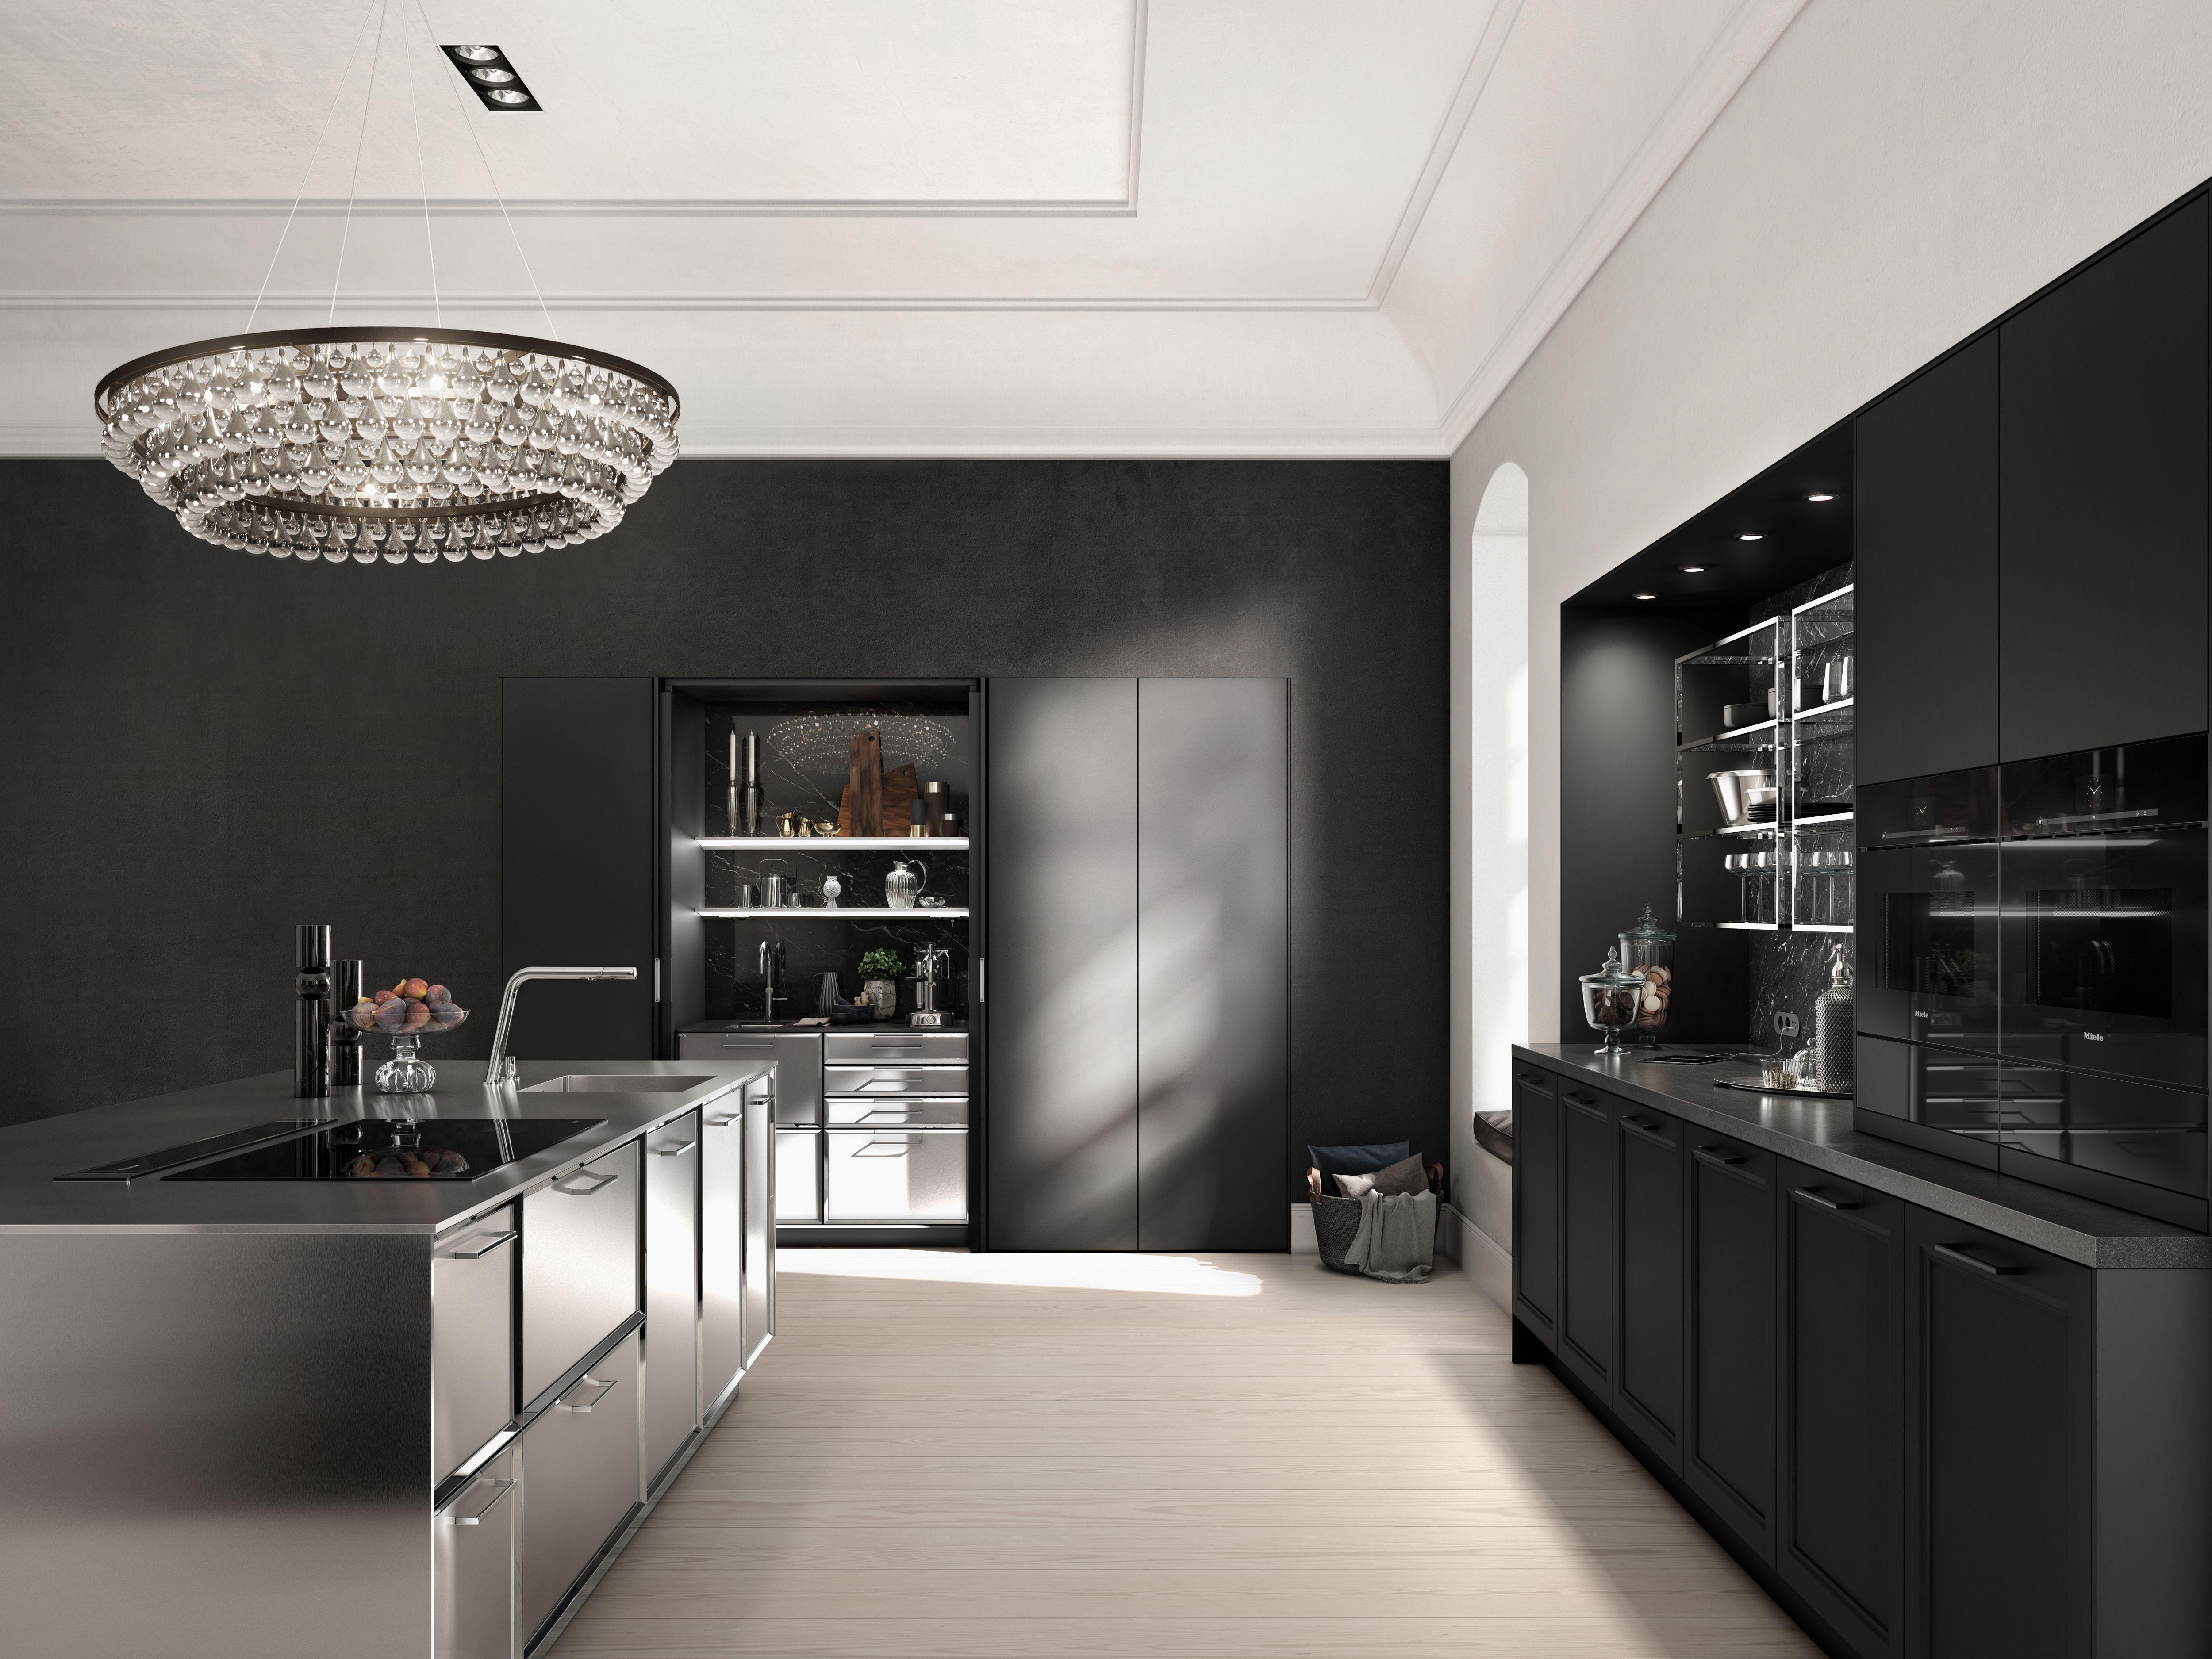 Beaux Arts Interior Design Plans siematic classic / beauxarts.02 + se the siematic interior design